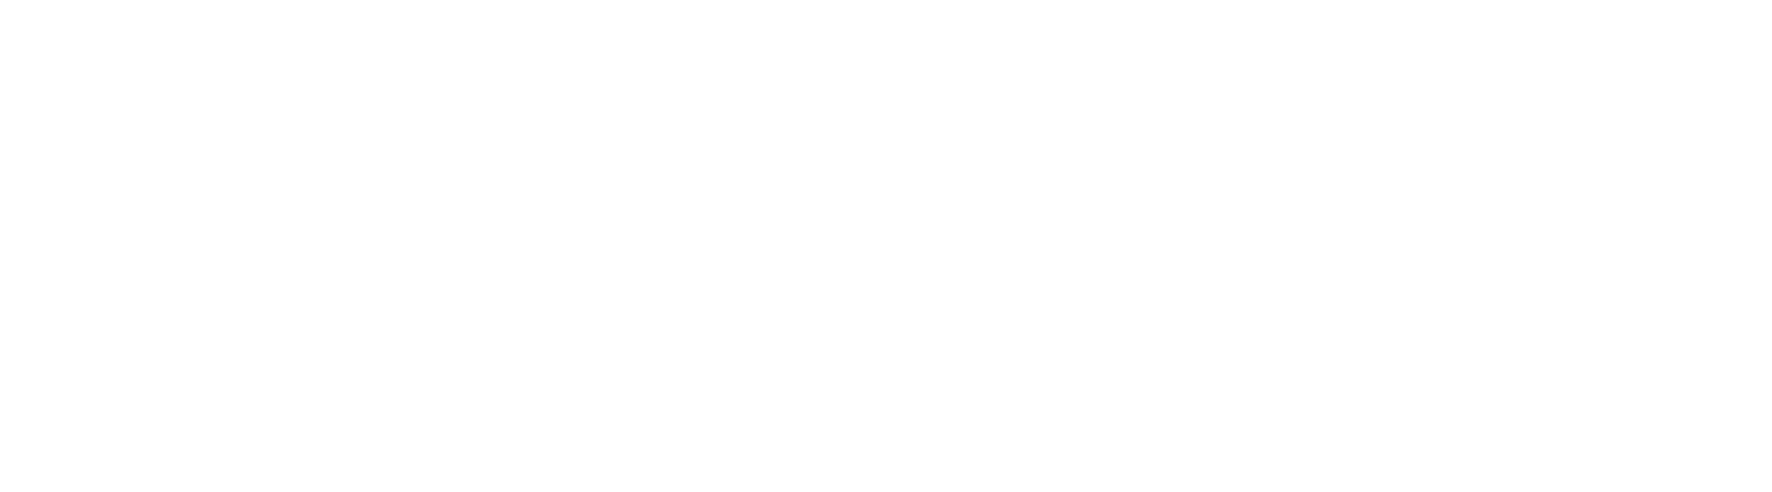 cropped-Archus_vit-1